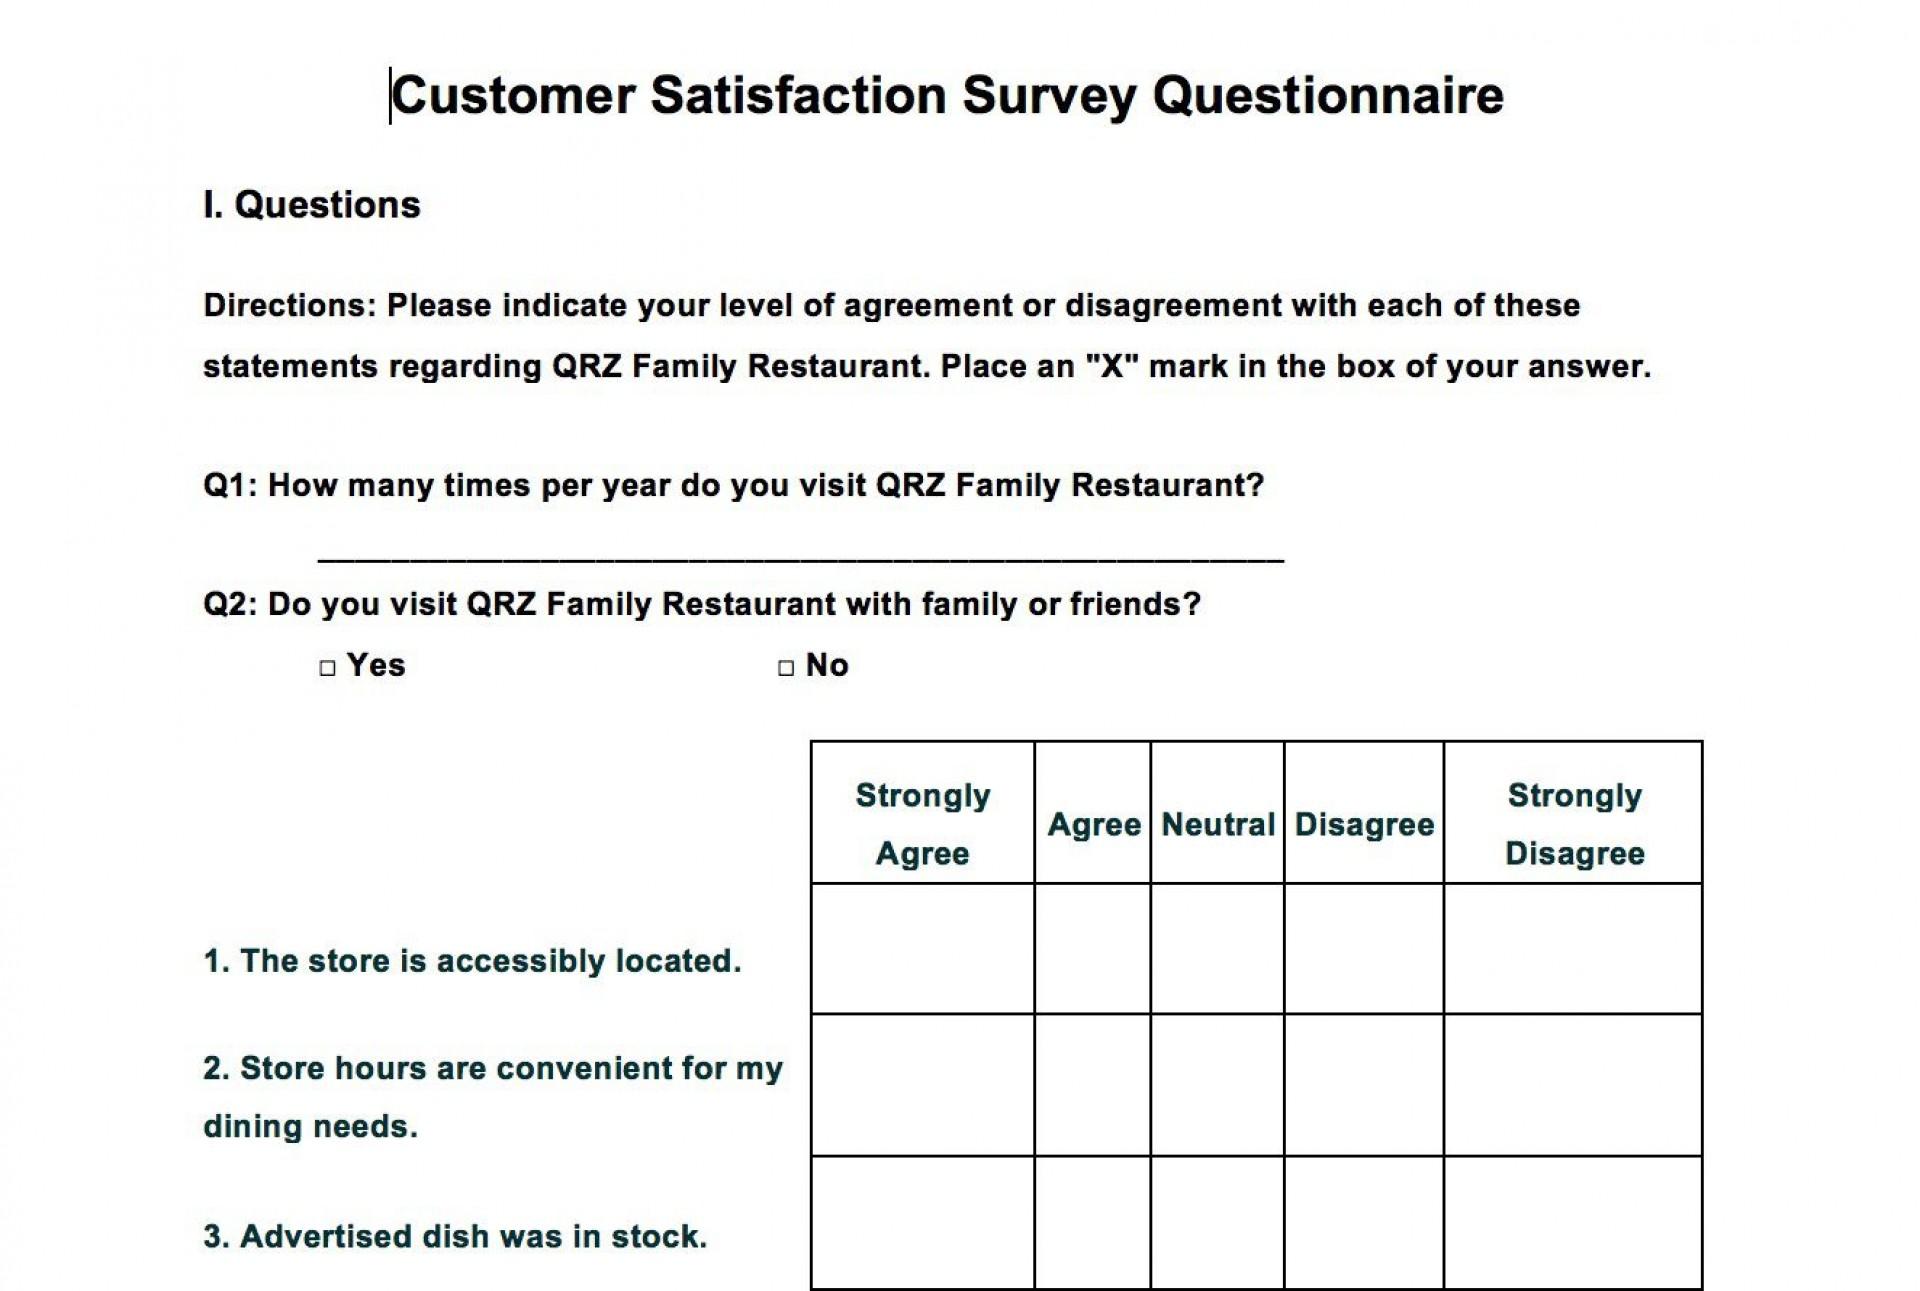 002 Singular Customer Satisfaction Survey Template Word Sample  Doc Form1920